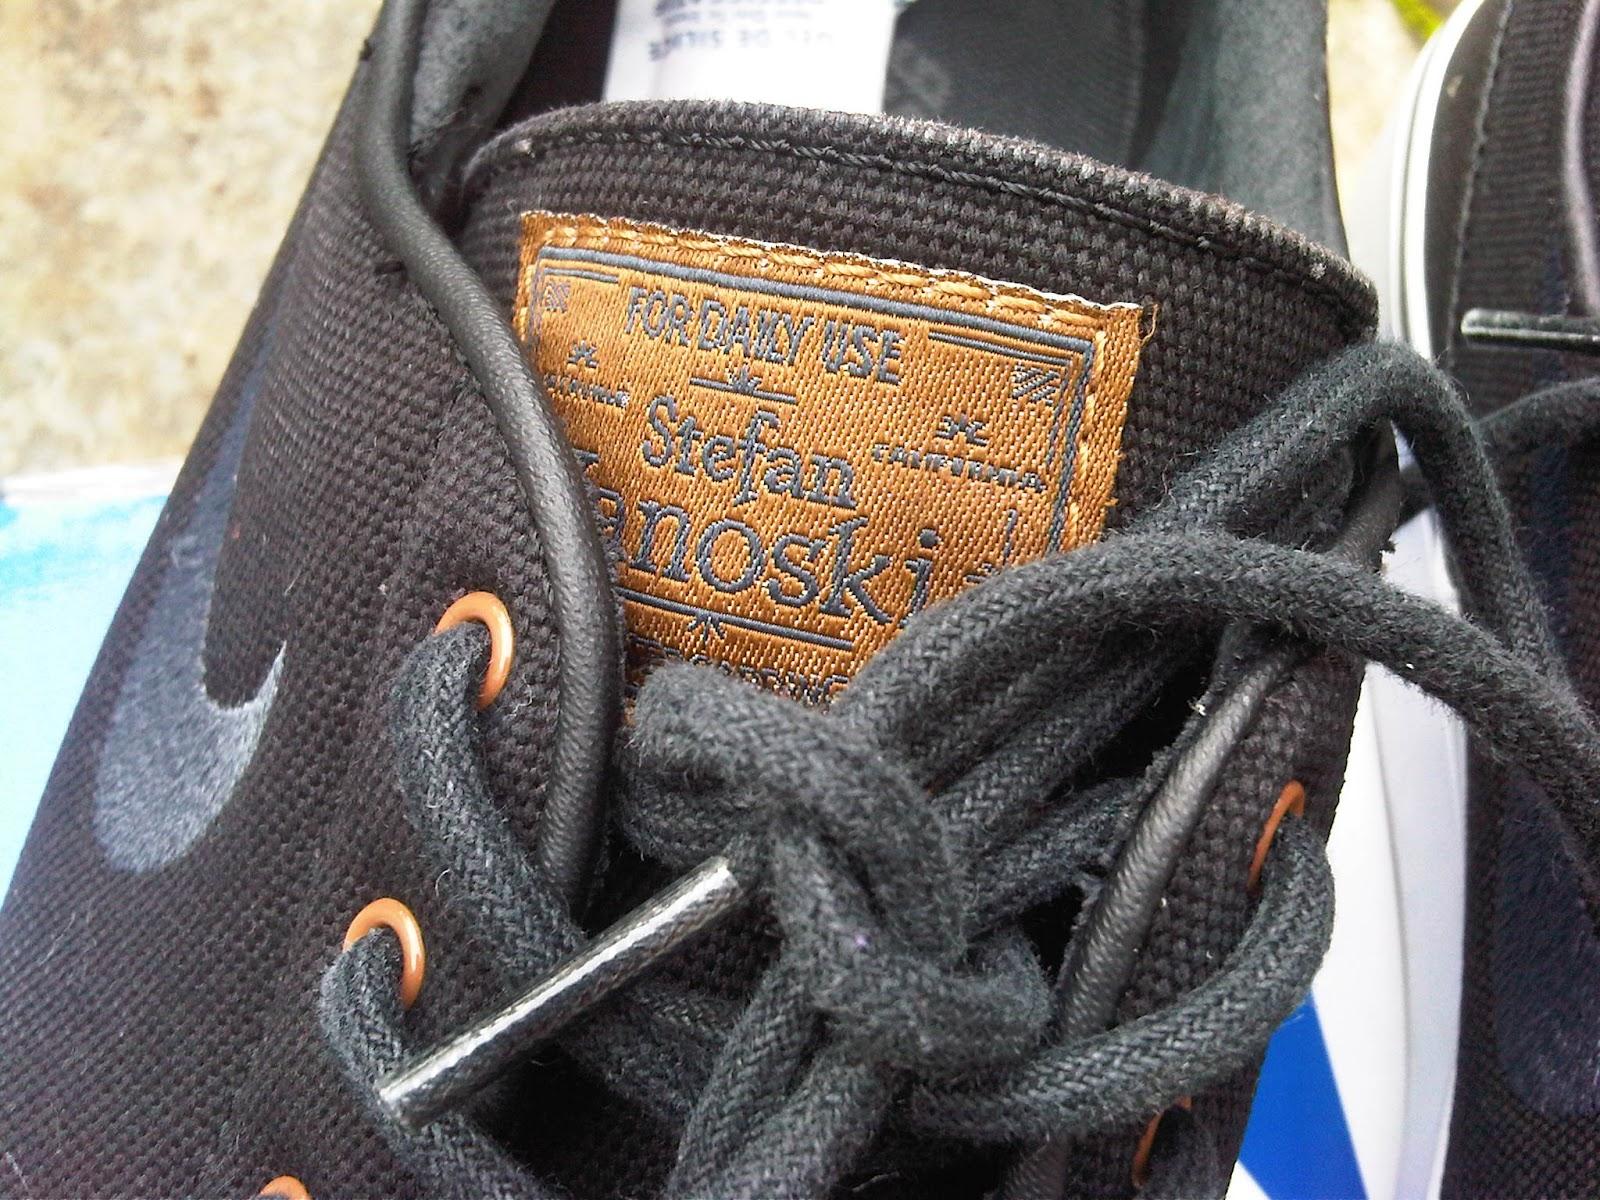 8995a476dbc2 Low profile canvas Nike SB Zoom Stefan Janoski pro model skate shoes feature  a durable black canvas upper